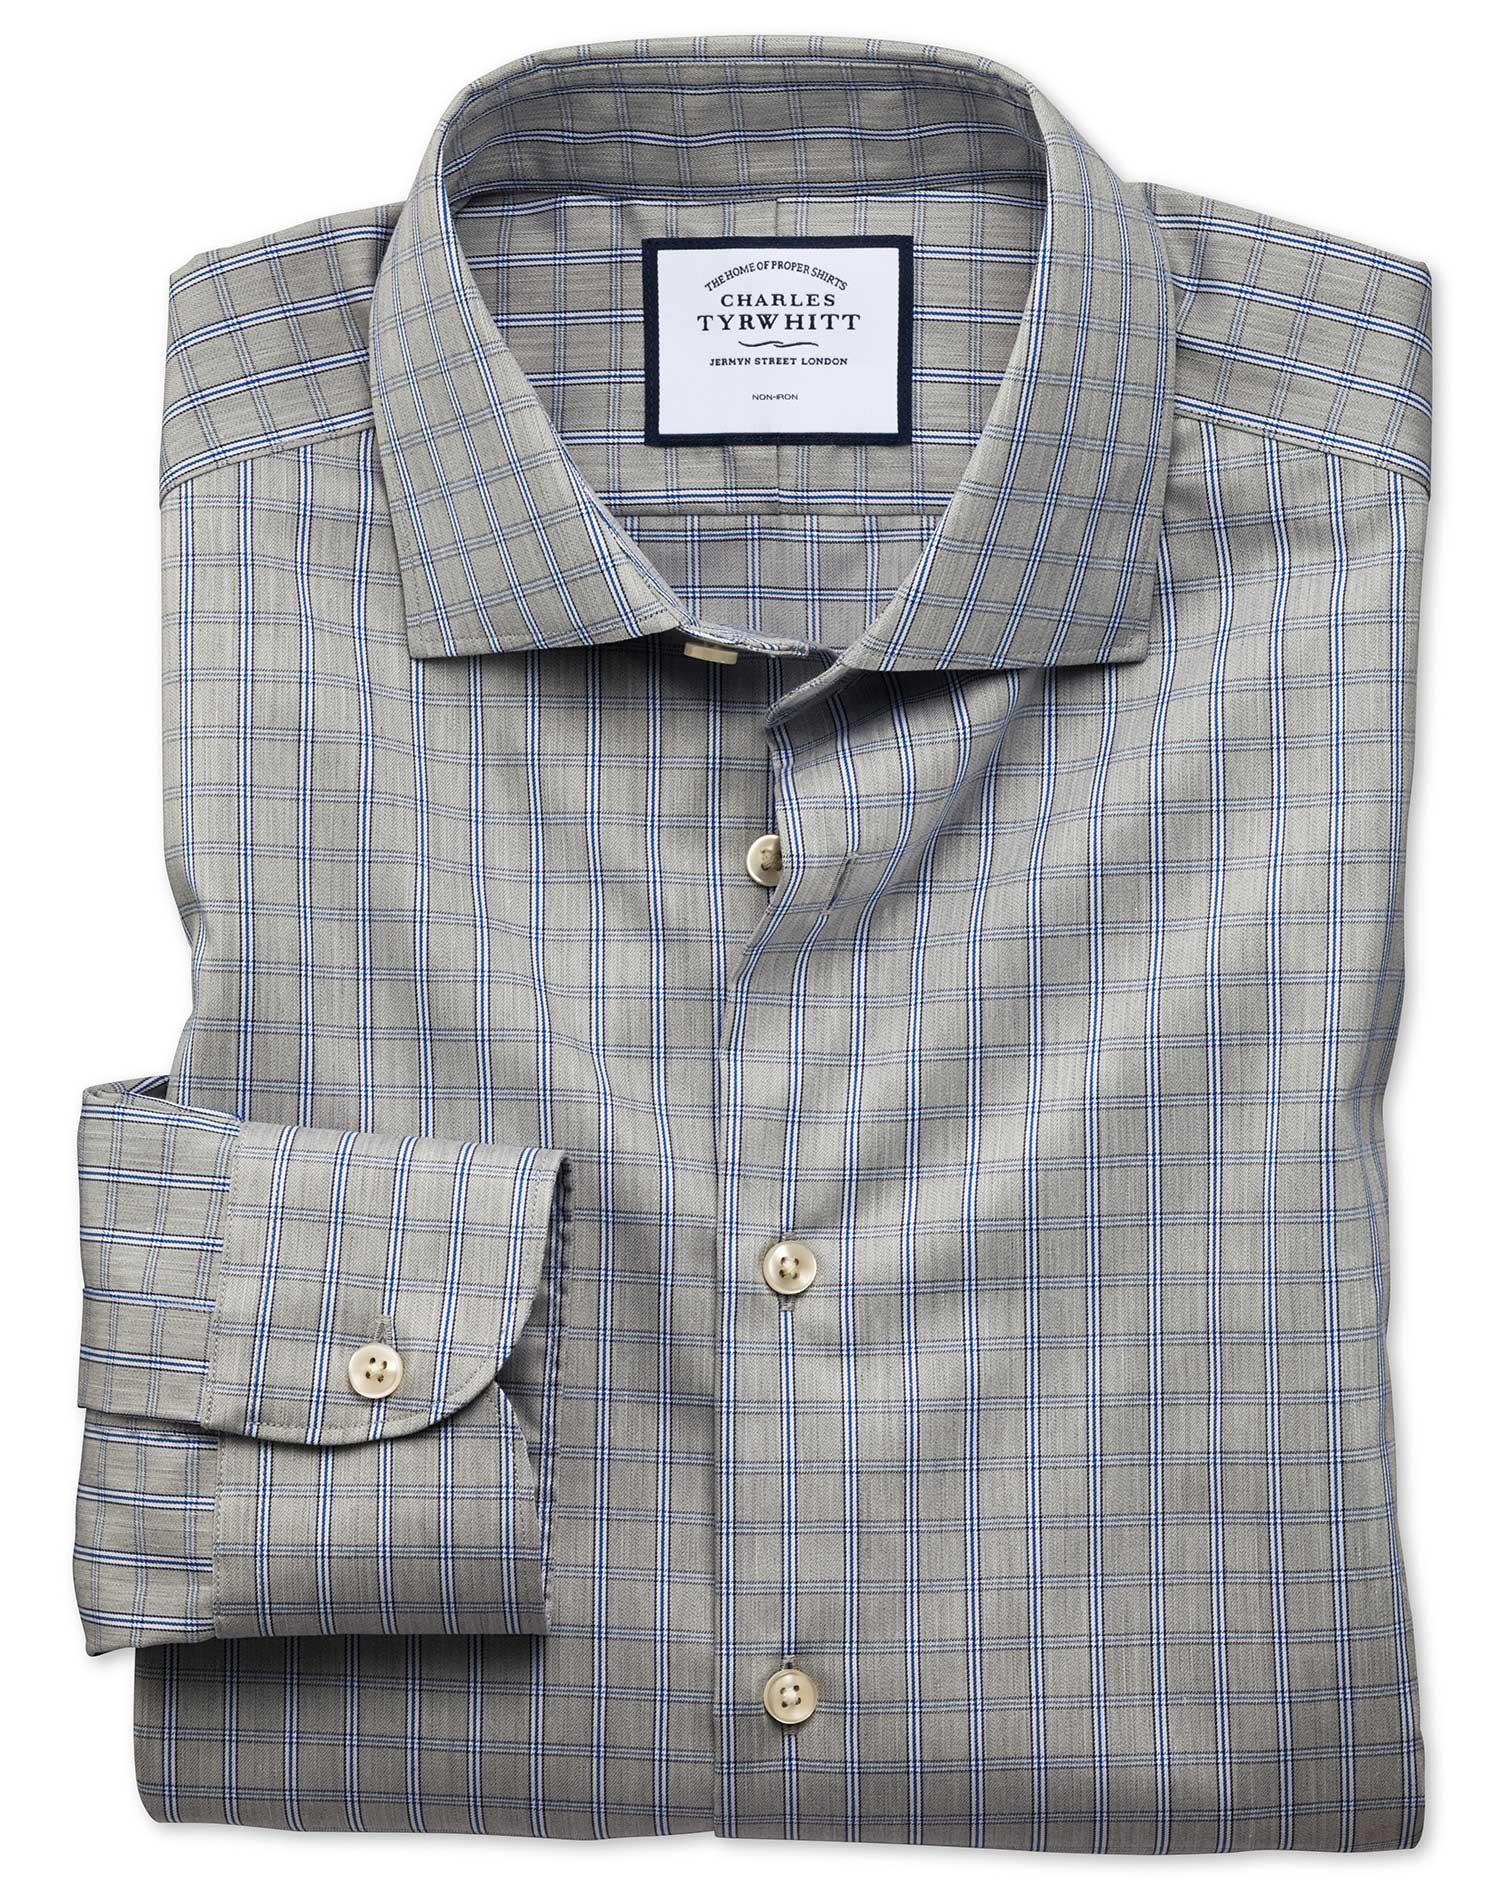 Slim Fit Business Casual Non-Iron Grey Windowpane Check Cotton Formal Shirt Single Cuff Size 17.5/38